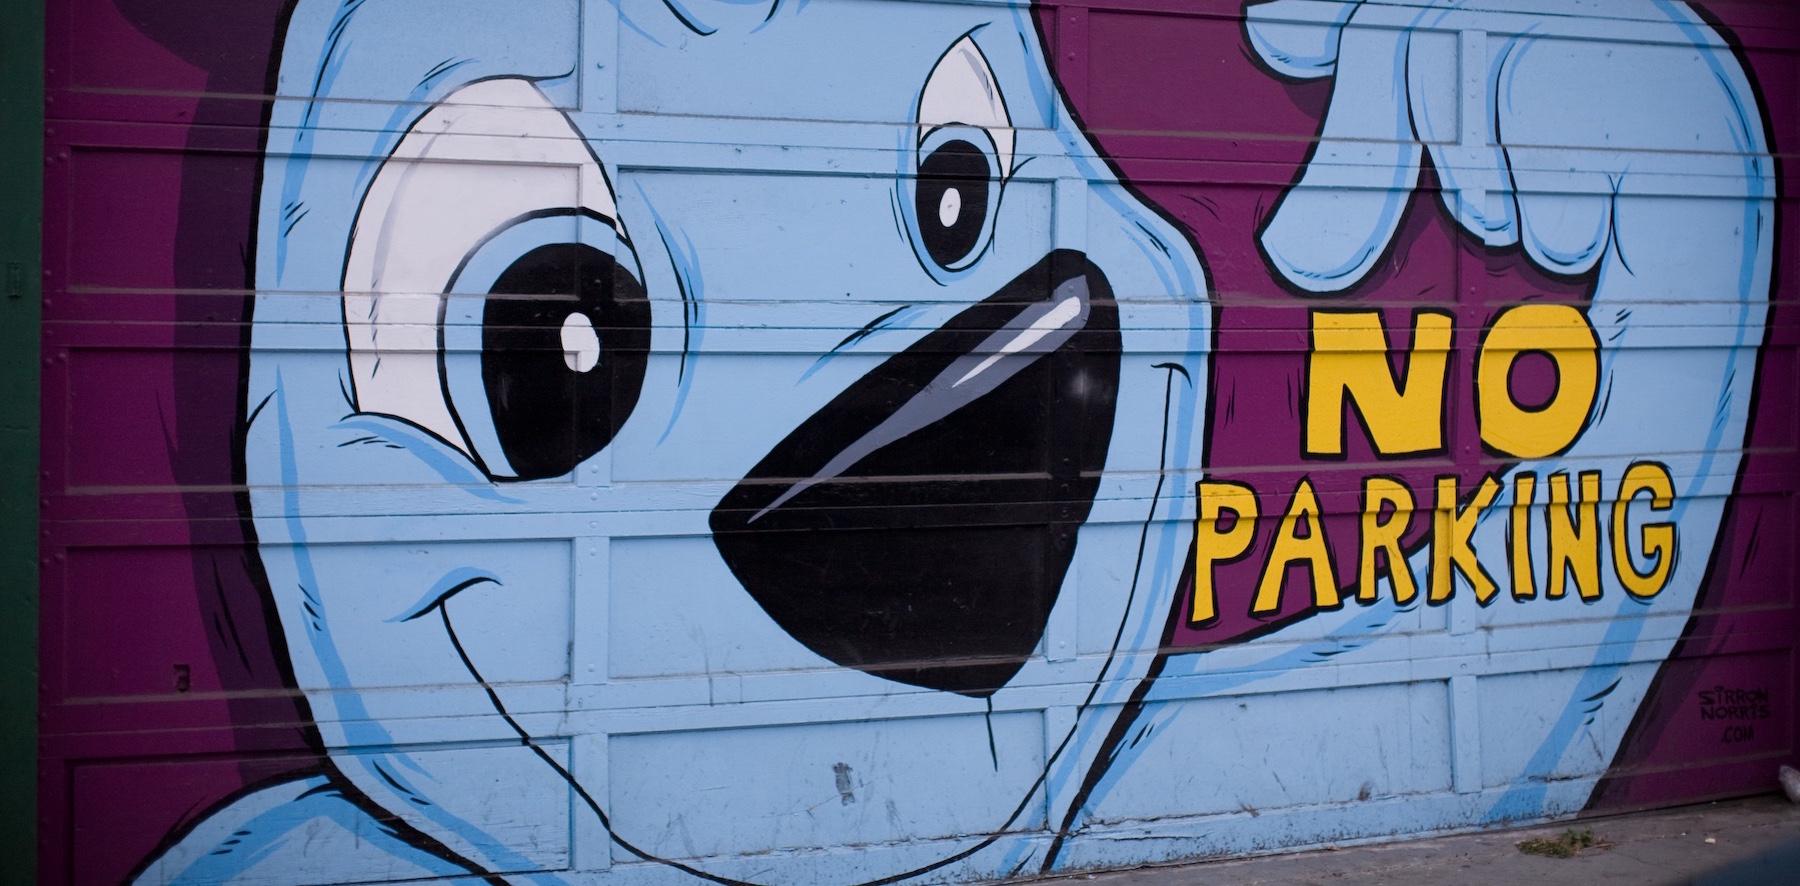 No parking sign Scott Beale/Flickr